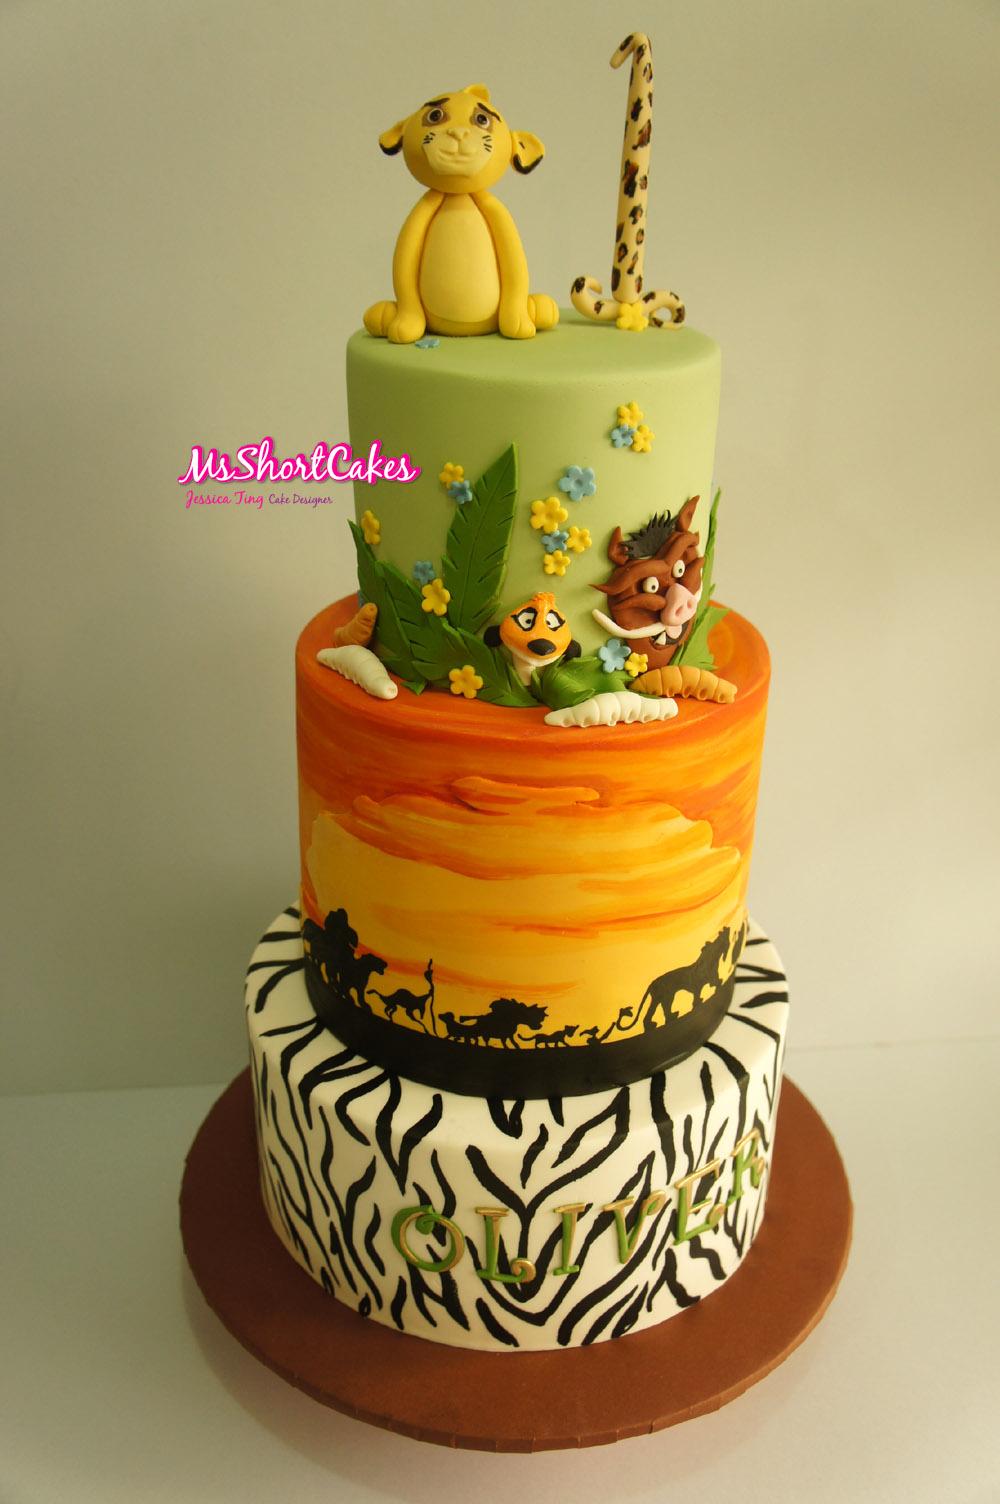 Miss Shortcakes A Lion King Party